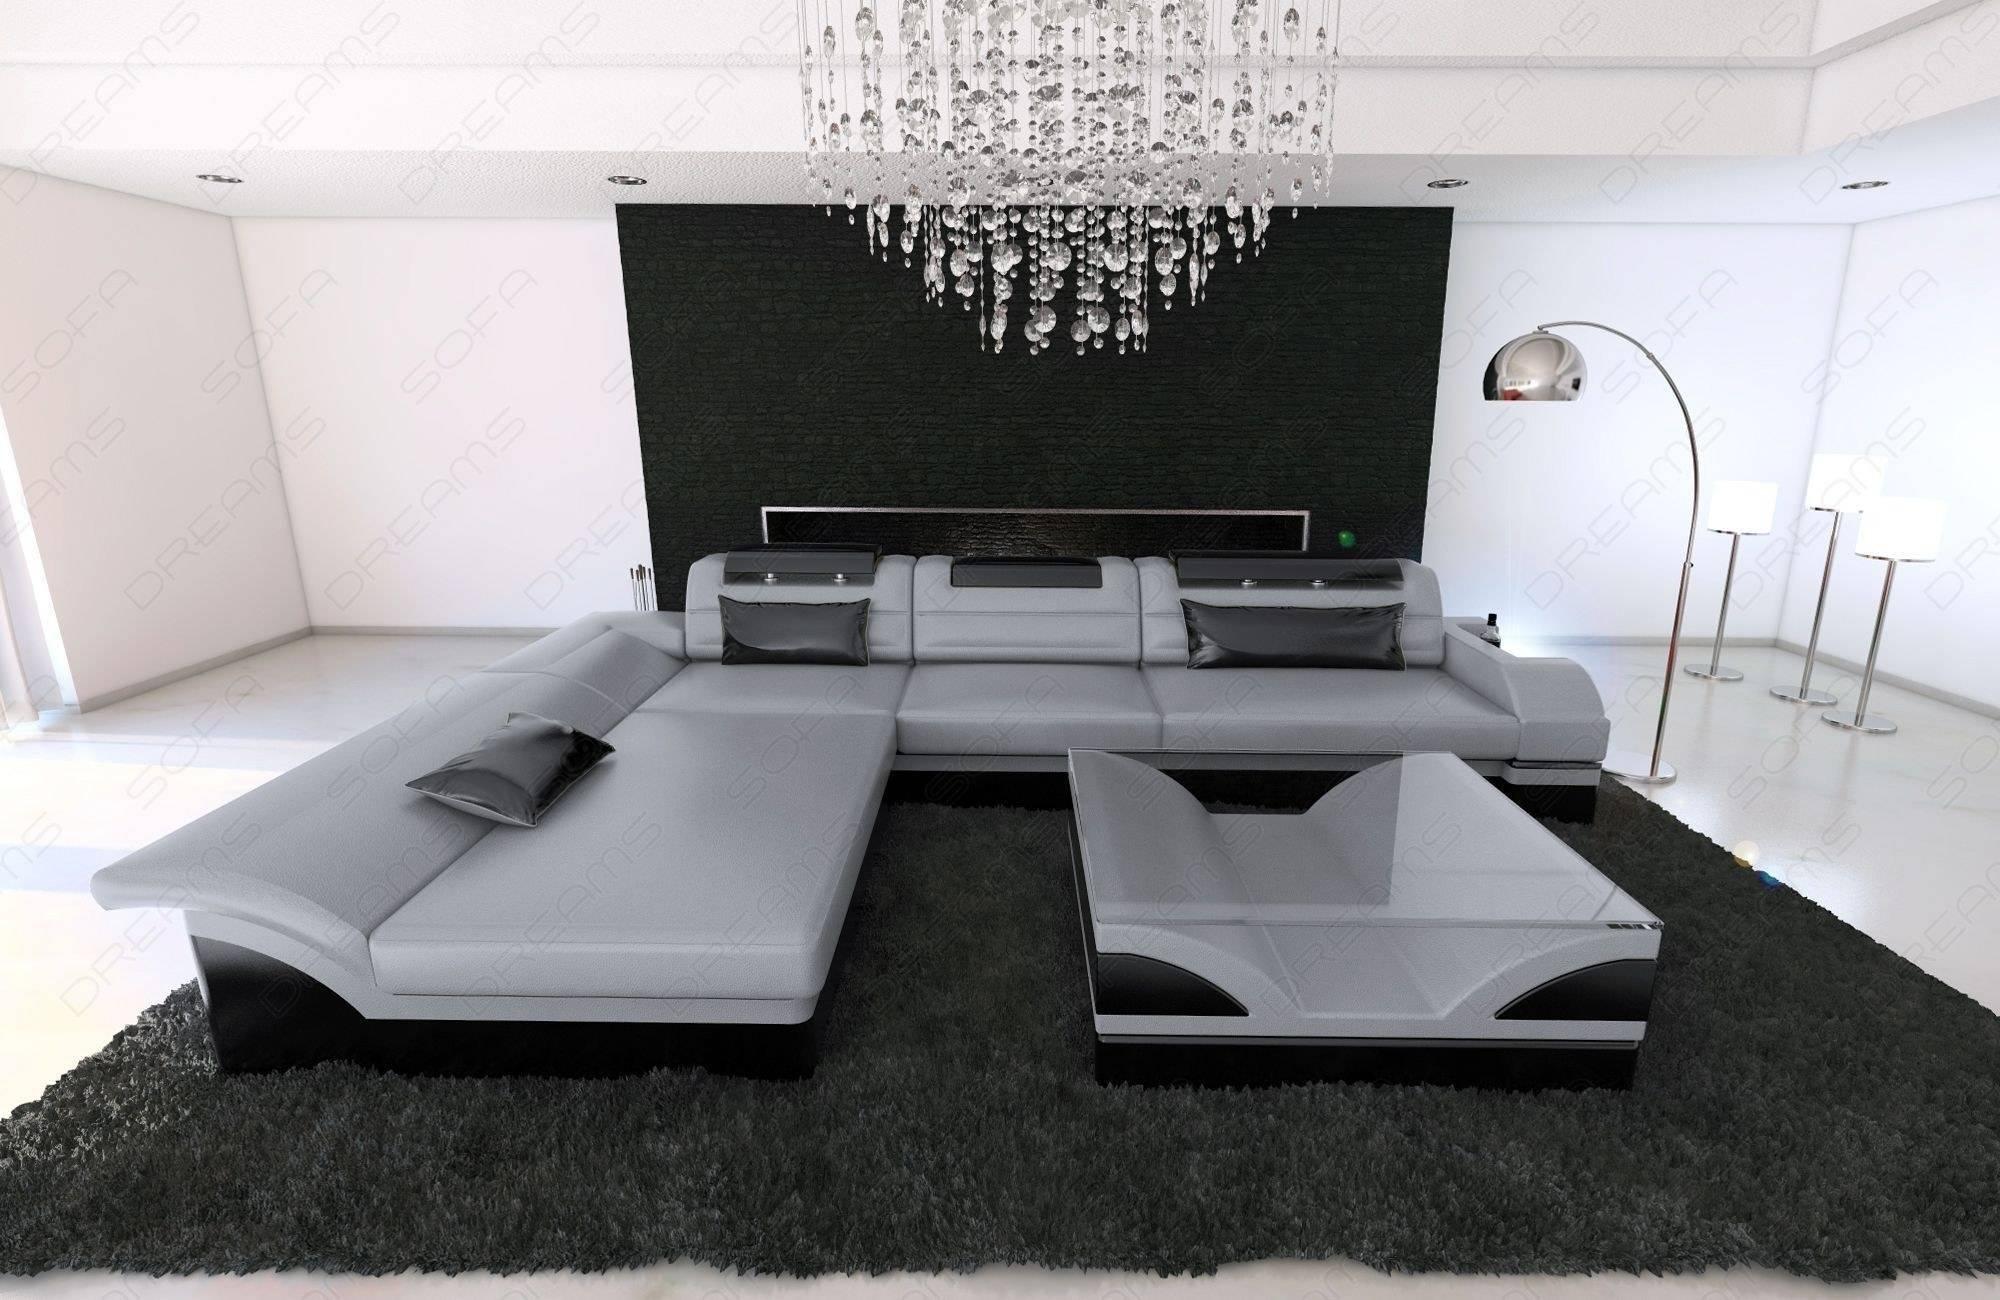 Modern Corner Sofa Chicago Led L- Shaped pertaining to Black Corner Sofas (Image 12 of 15)